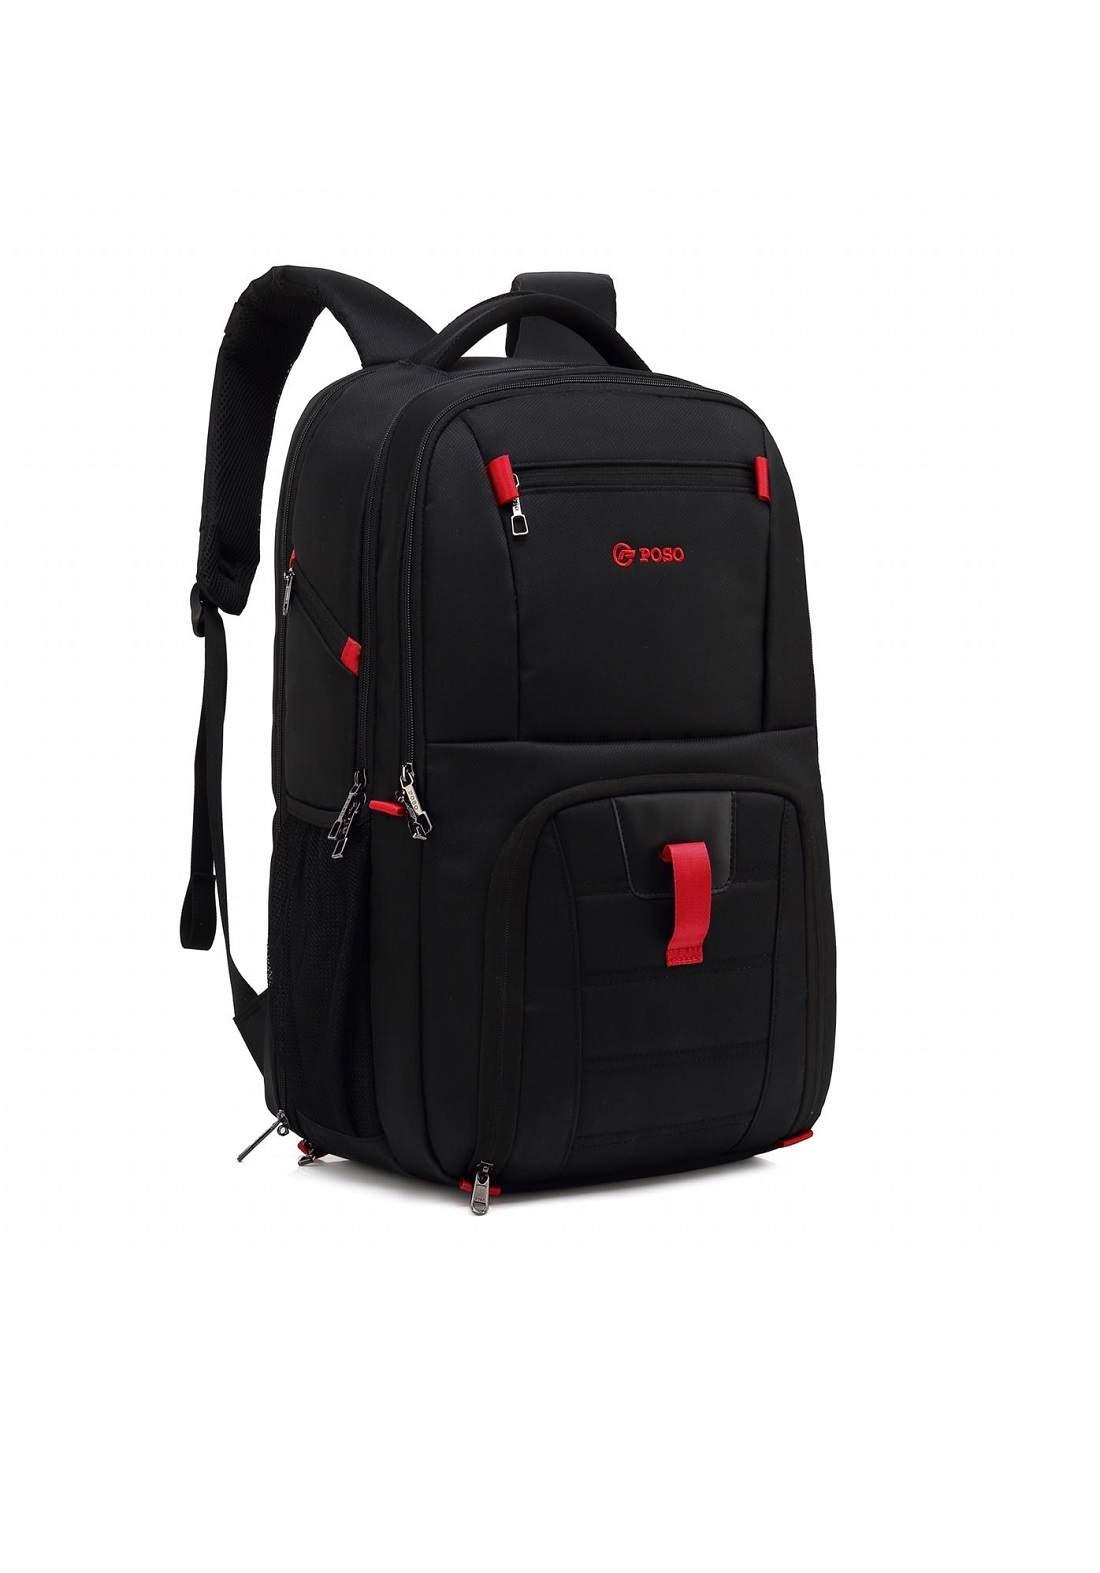 Poso PS-501 Laptop Bag-Black حقيبة لابتوب